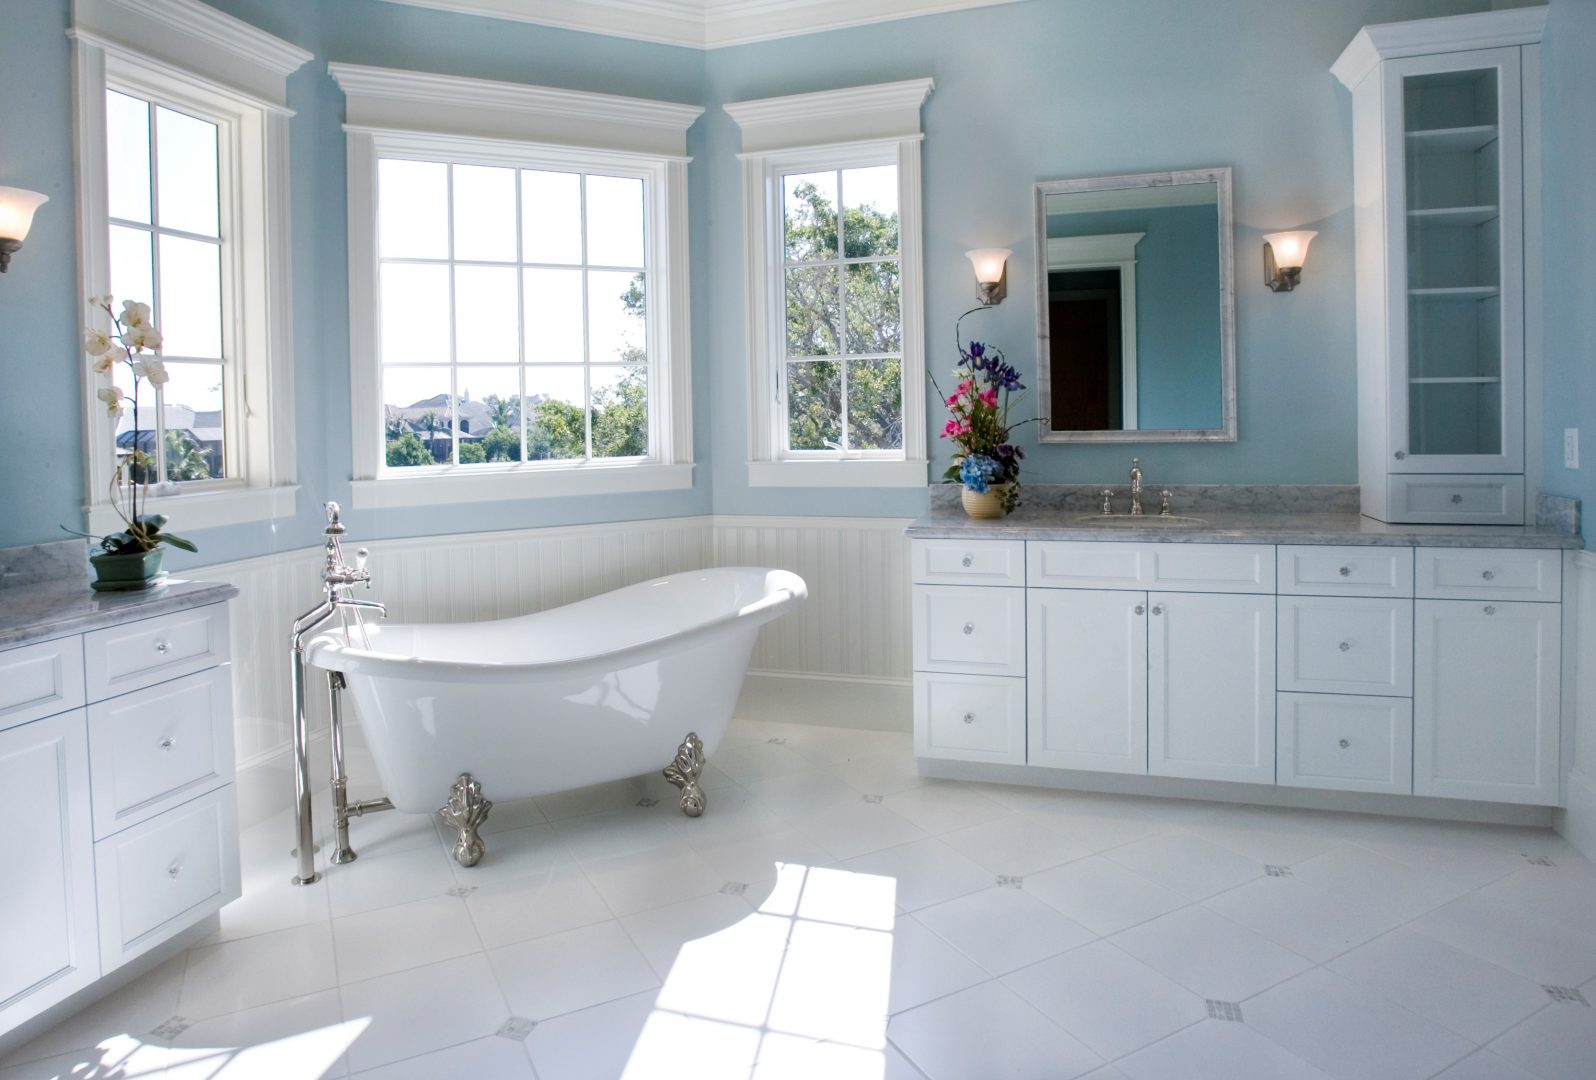 Bathroom Renovations Classic style with nostalgic bathtub